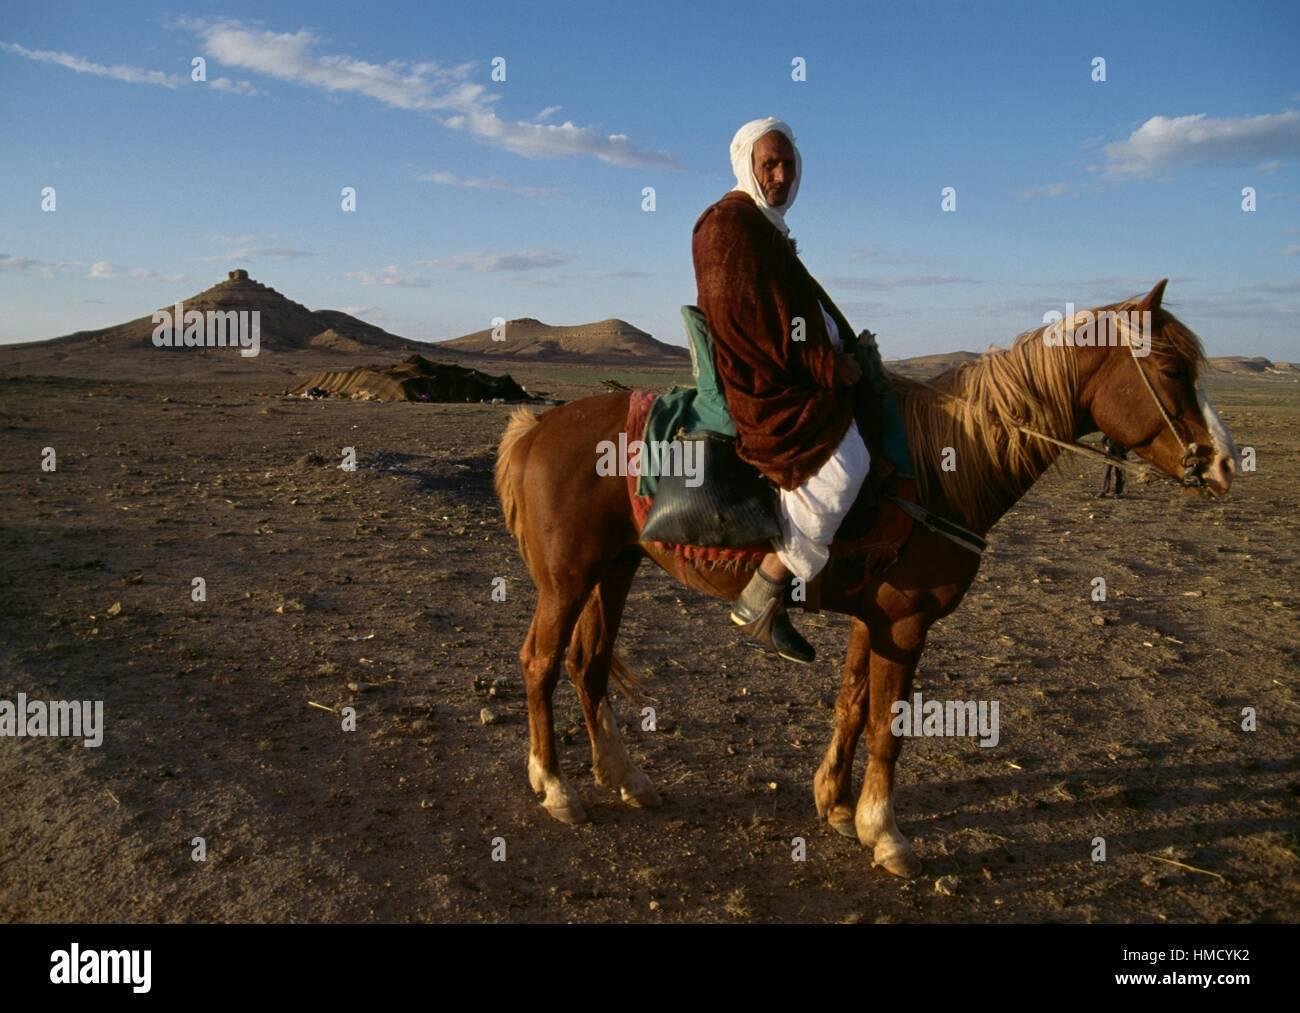 A man on horseback, Djebel Amour, Algeria. - Stock Image